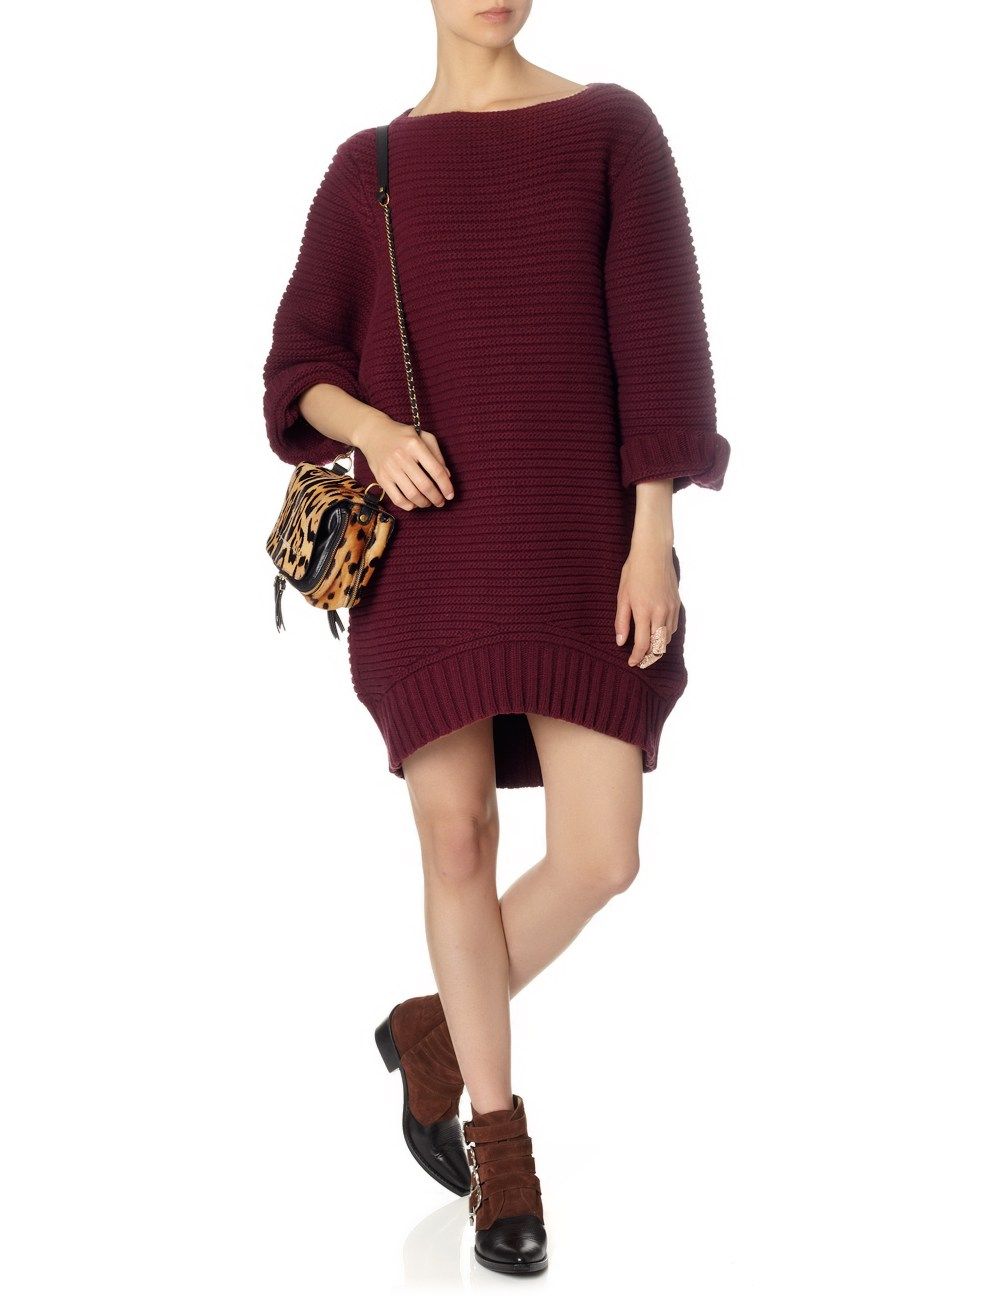 Oxblood cup sleeve jumper dress